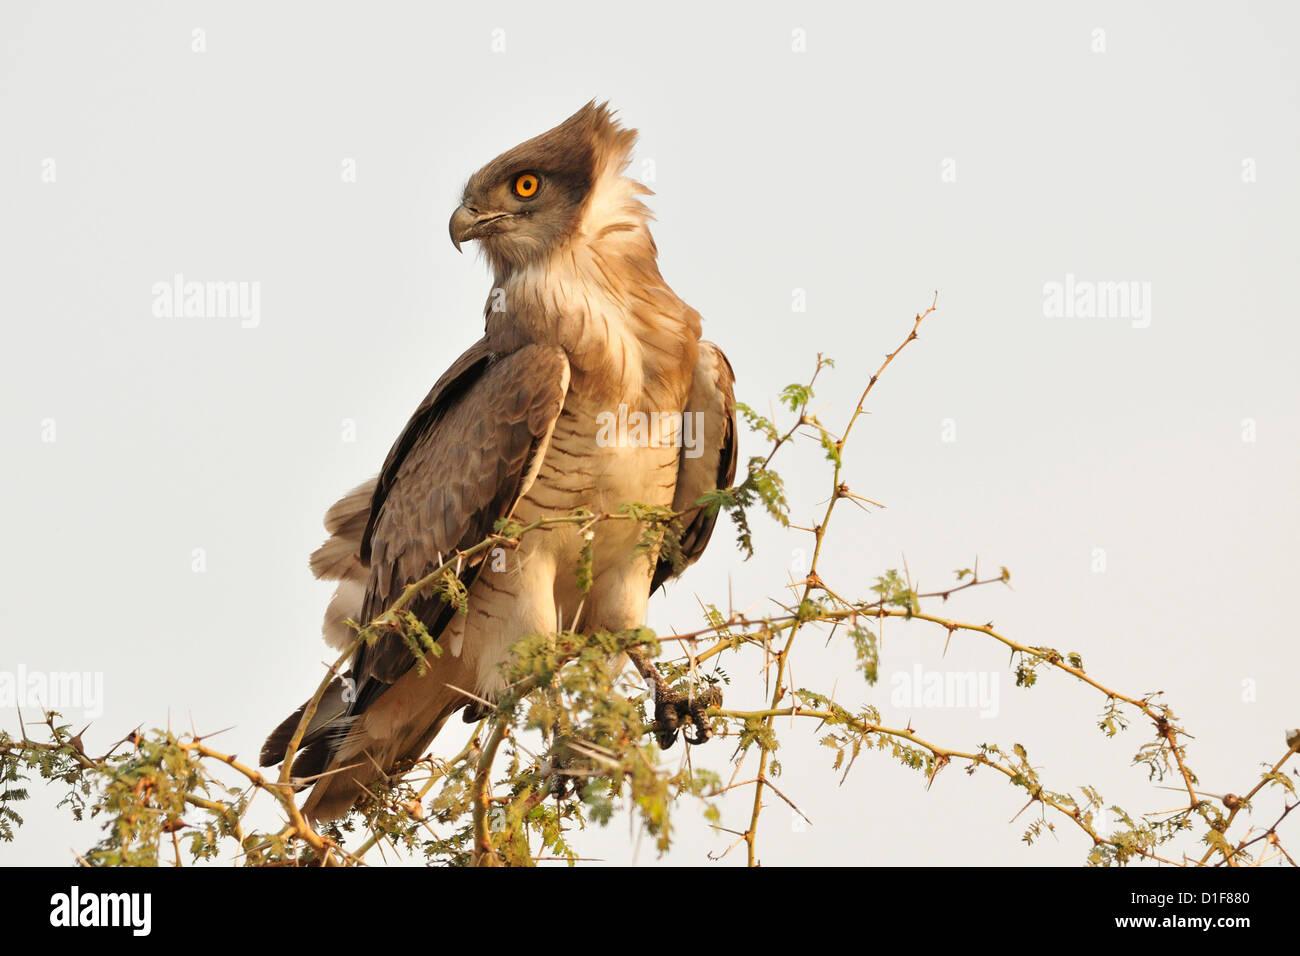 Snakes Eagle, Circaetus cinerascens, Gambella National Park, Ethiopia, Africa - Stock Image